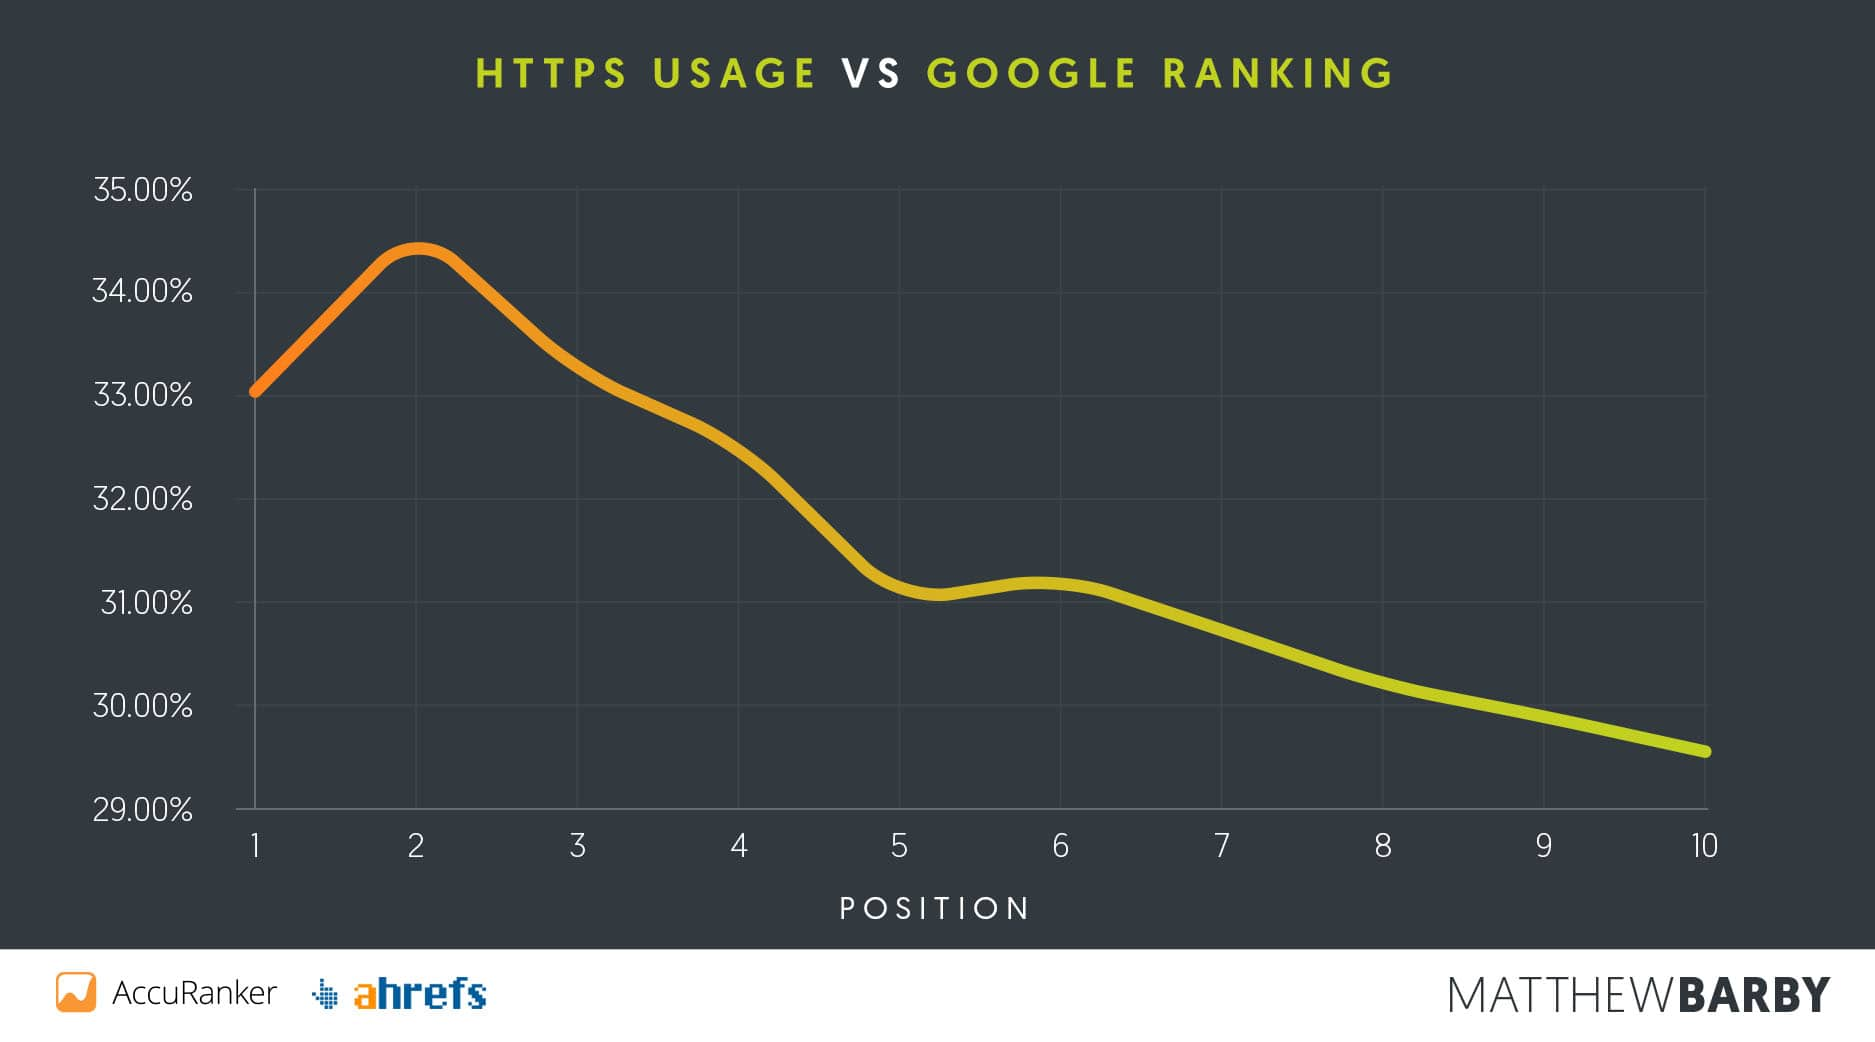 HTTPS-Nutzung vs Google-Ranking